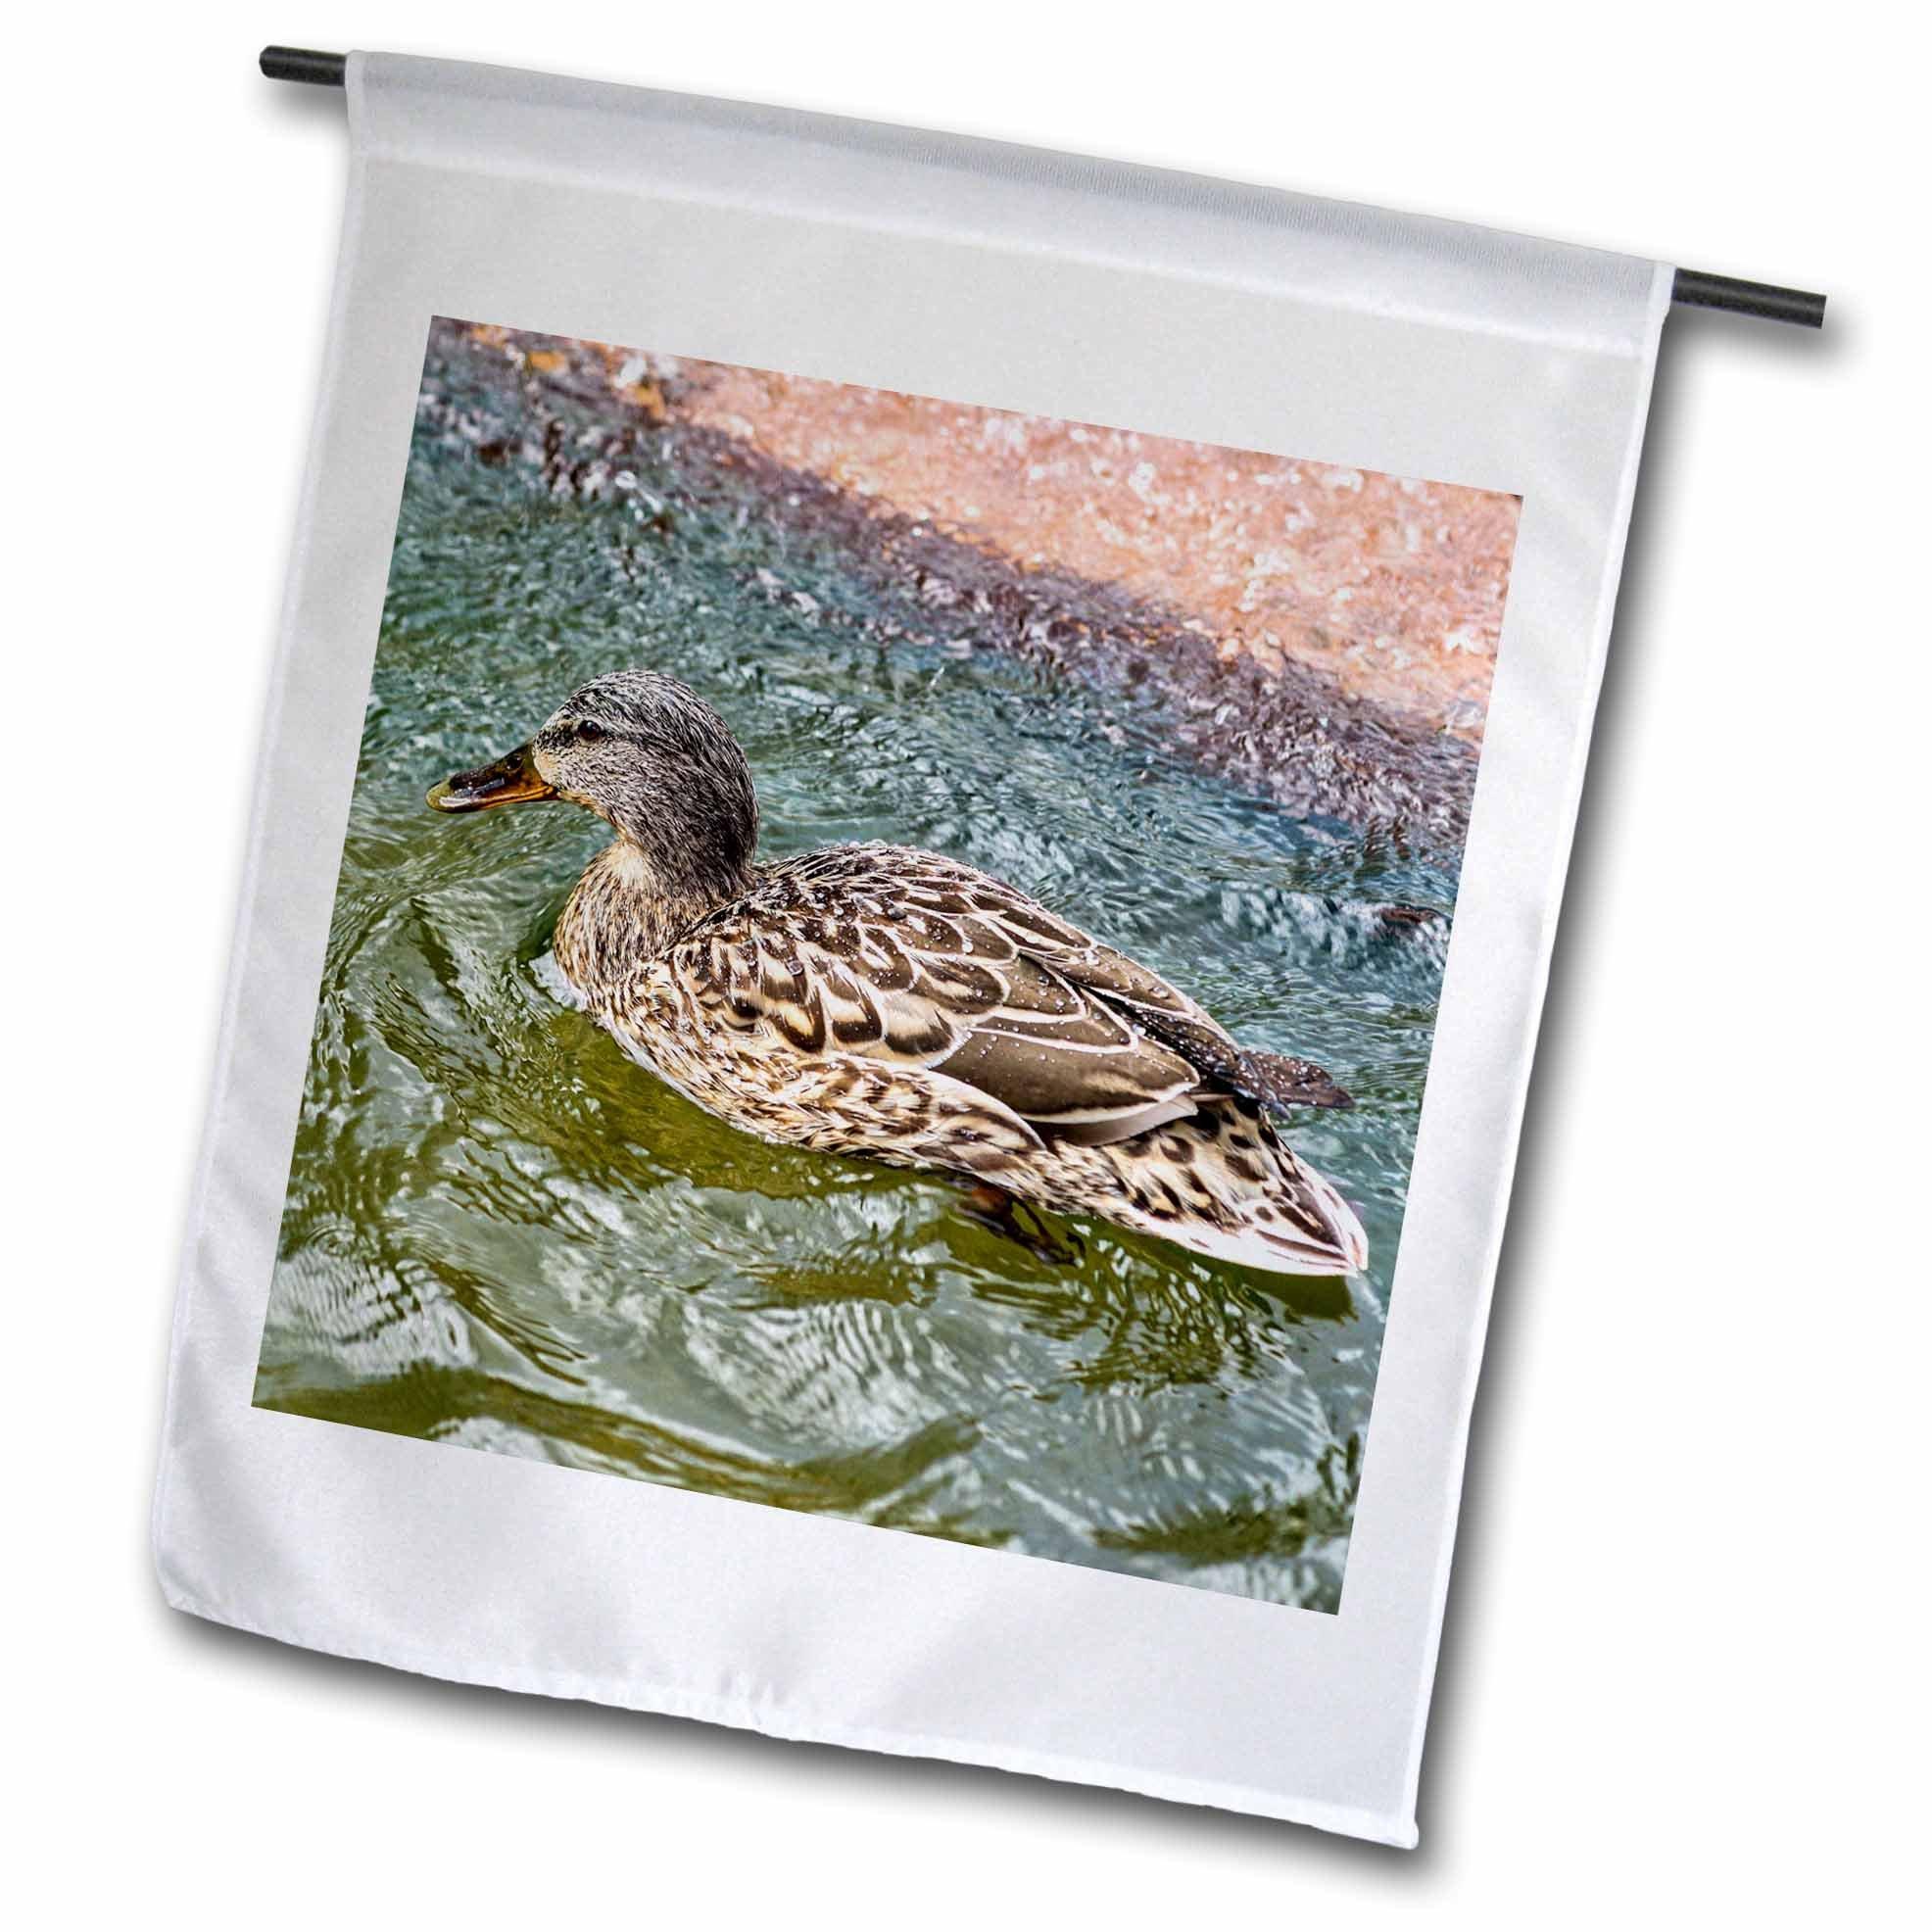 3dRose Alexis Photography - Birds - Brown mallard duck in a bubbling water of a city fountain - 18 x 27 inch Garden Flag (fl_281186_2)